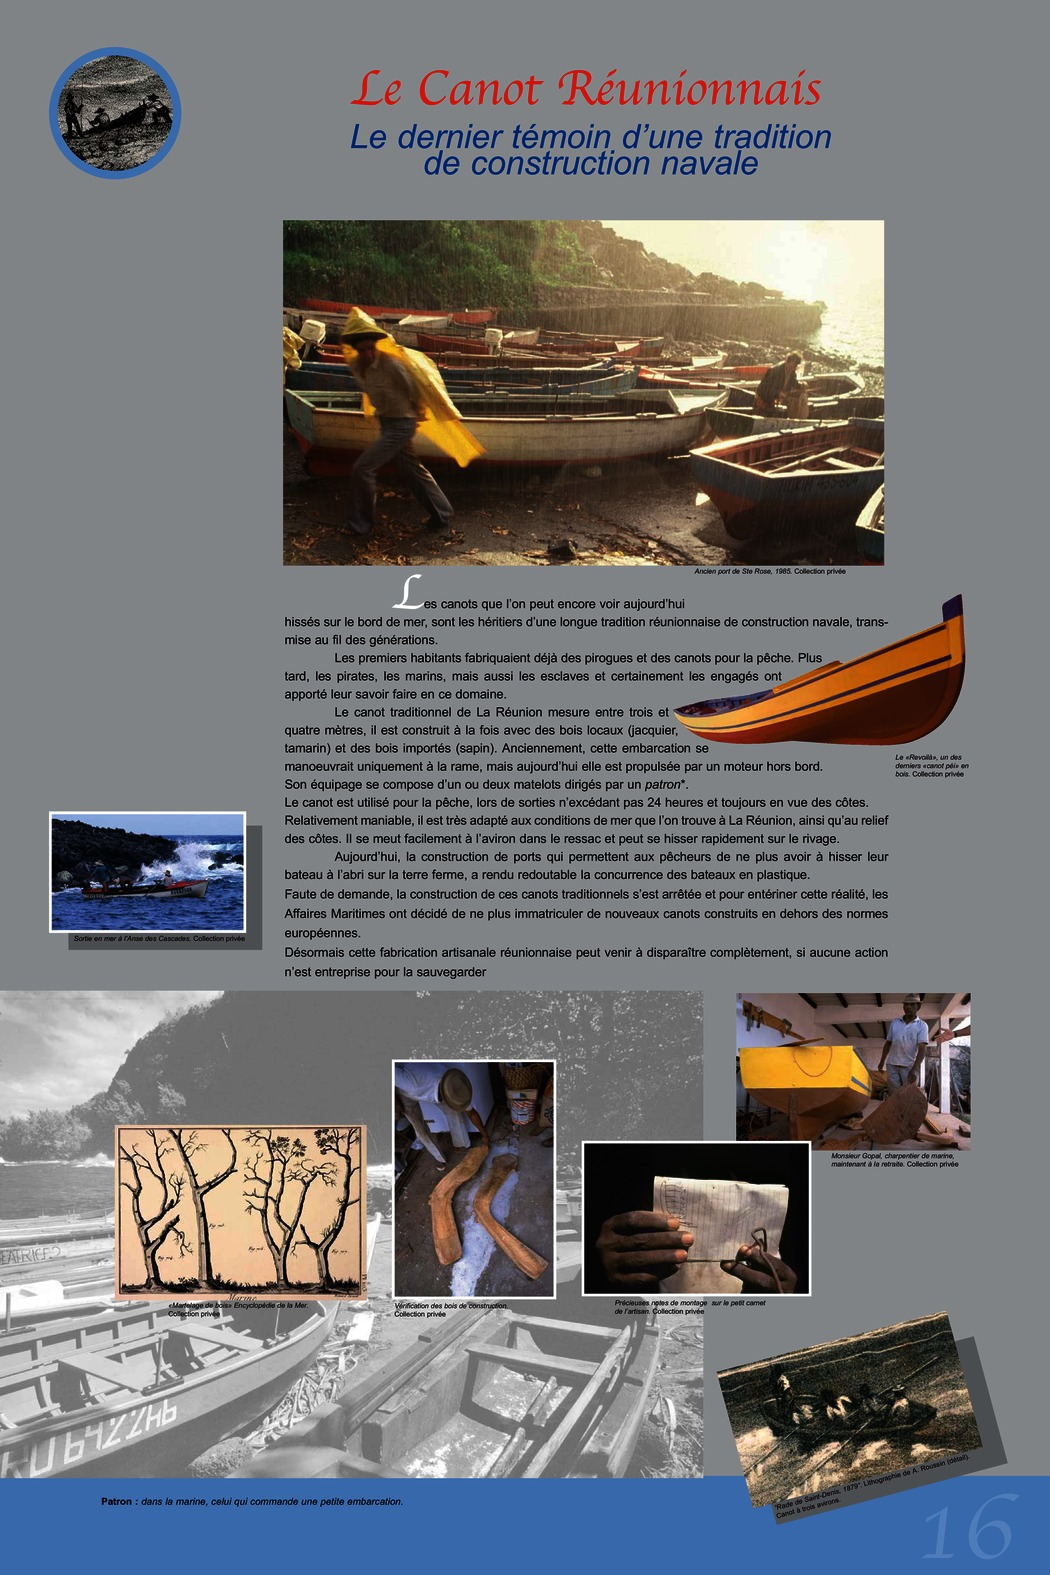 Le Canot Réunionnais